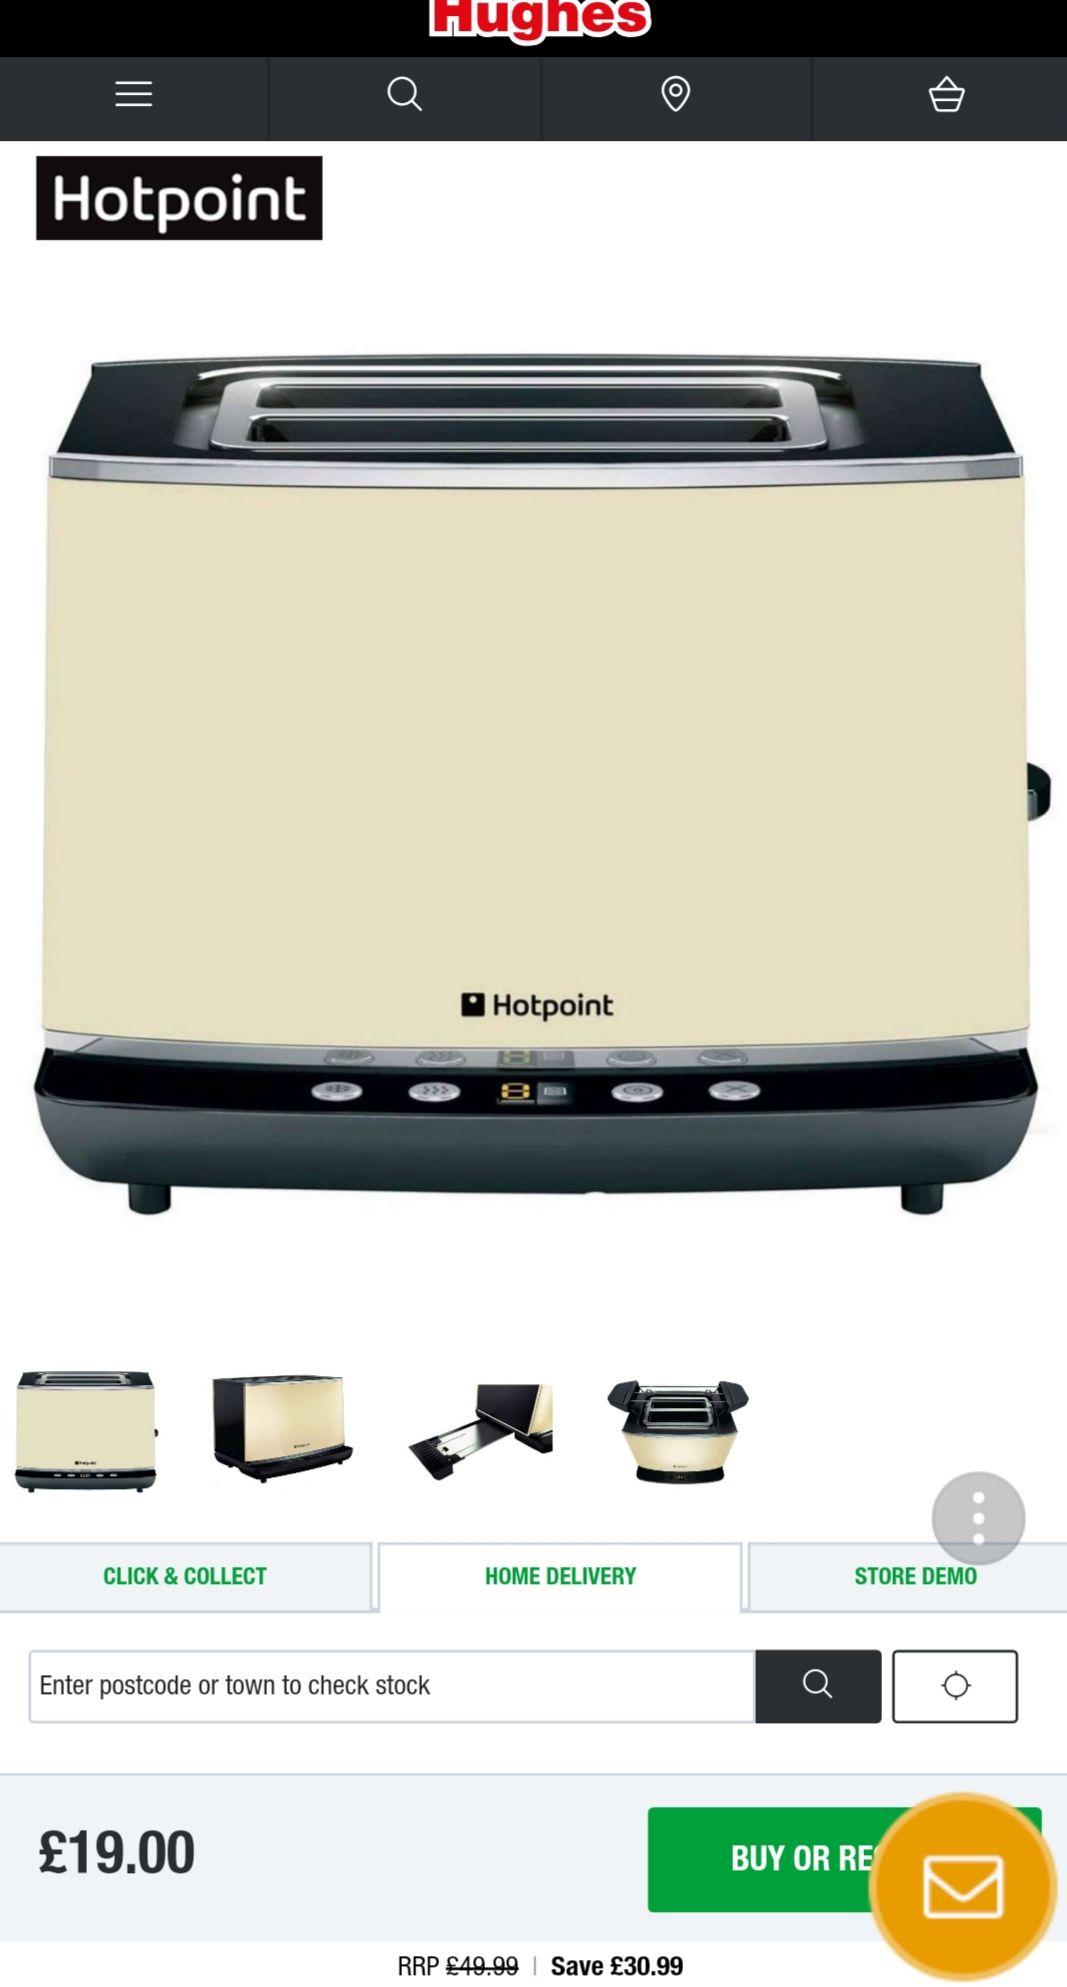 Hotpoint 850W 2 Slice Digital Toaster £19 @ Hughes